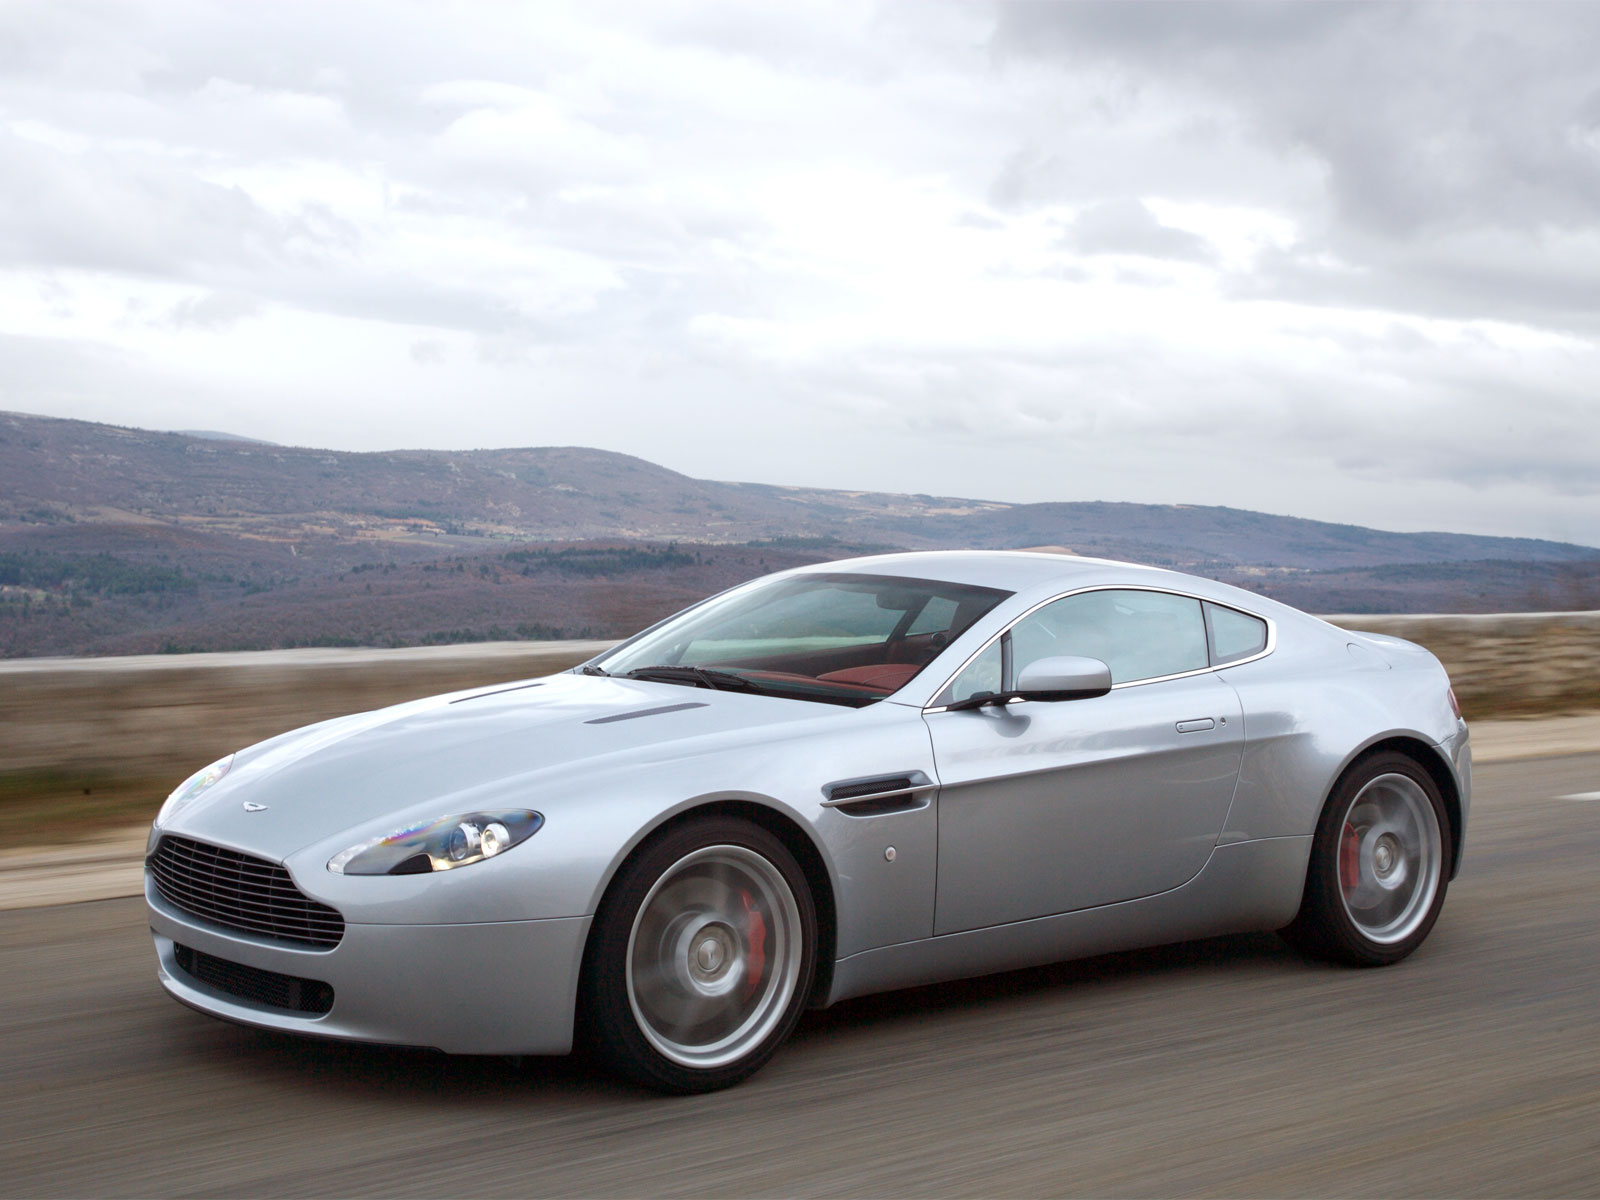 2007-Aston-Martin-V8-Vantage-49